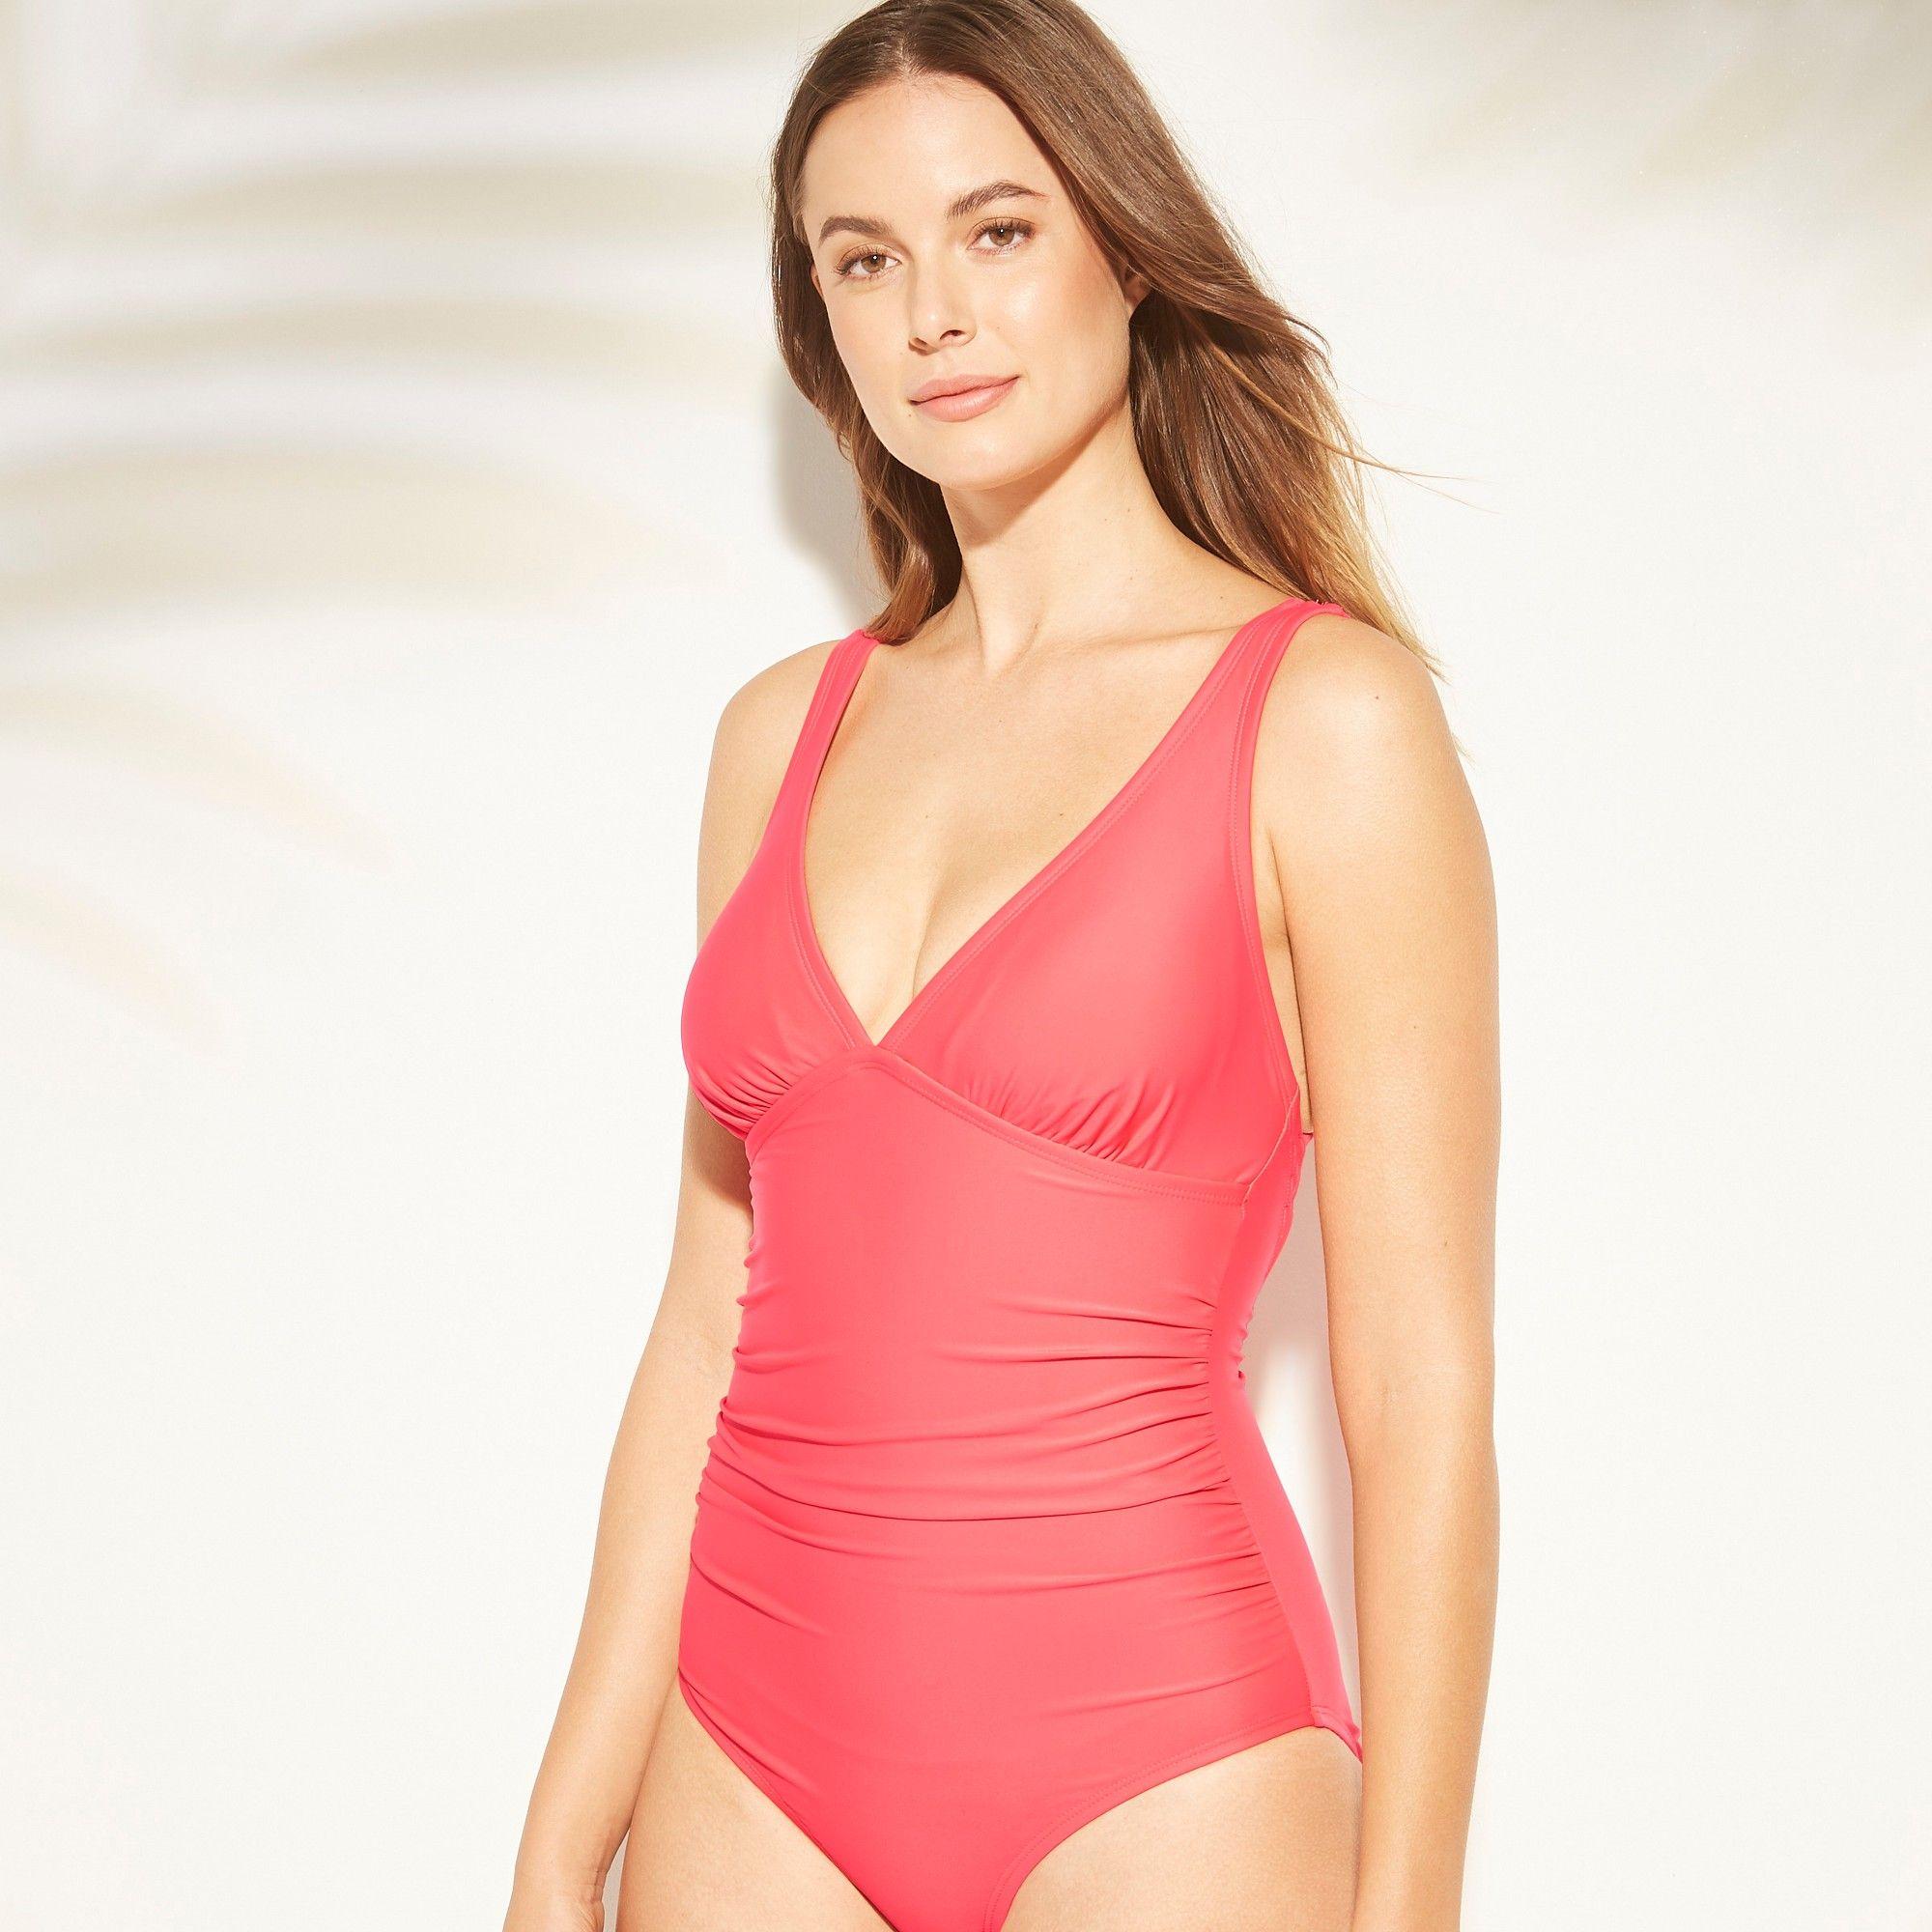 374bb497e74 Women's Tall/Long Torso Strappy Back One Piece Swimsuit - Kona Sol Blazing  Coral XL